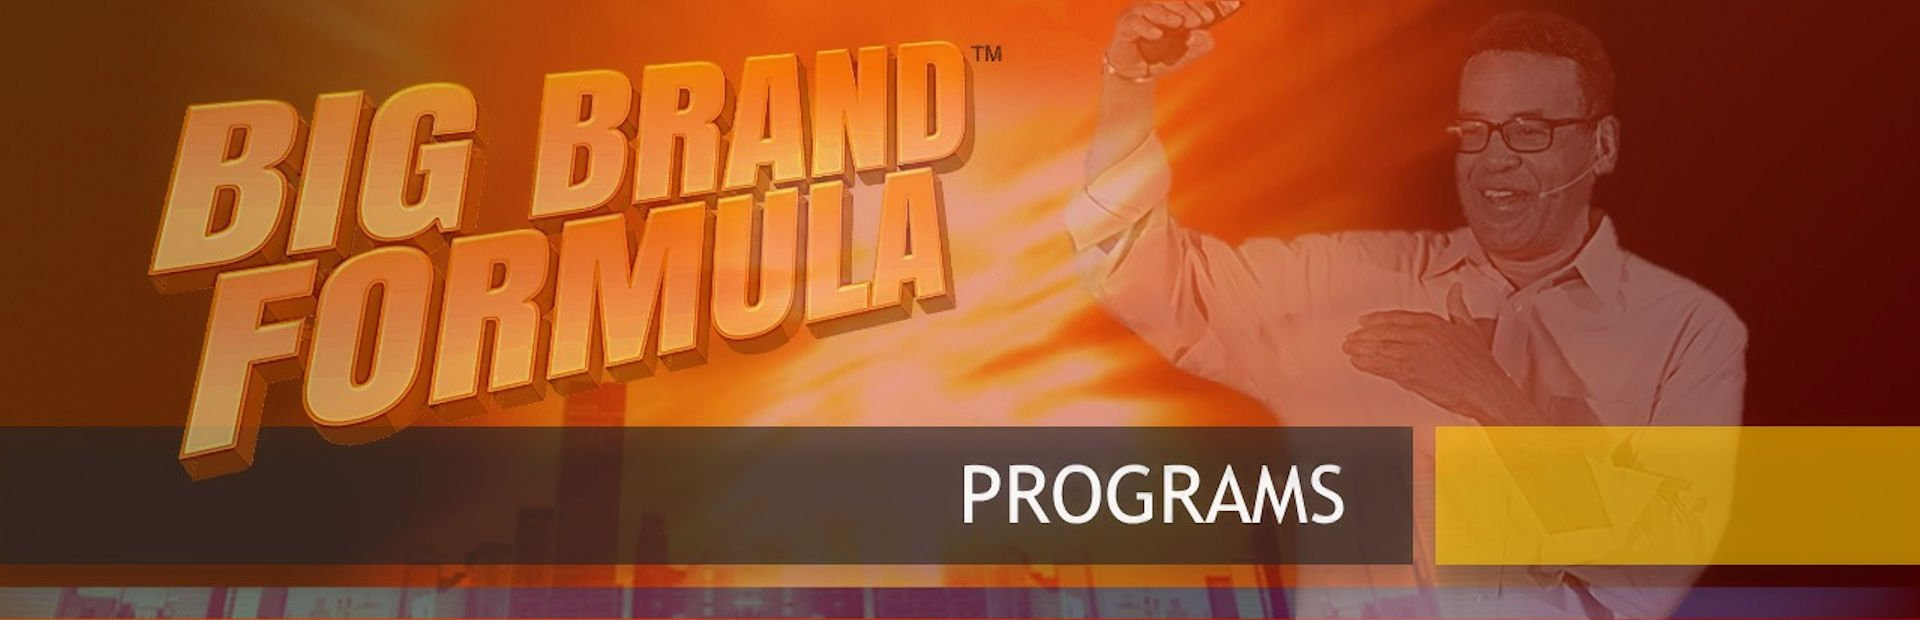 Big Brand Formula Programs